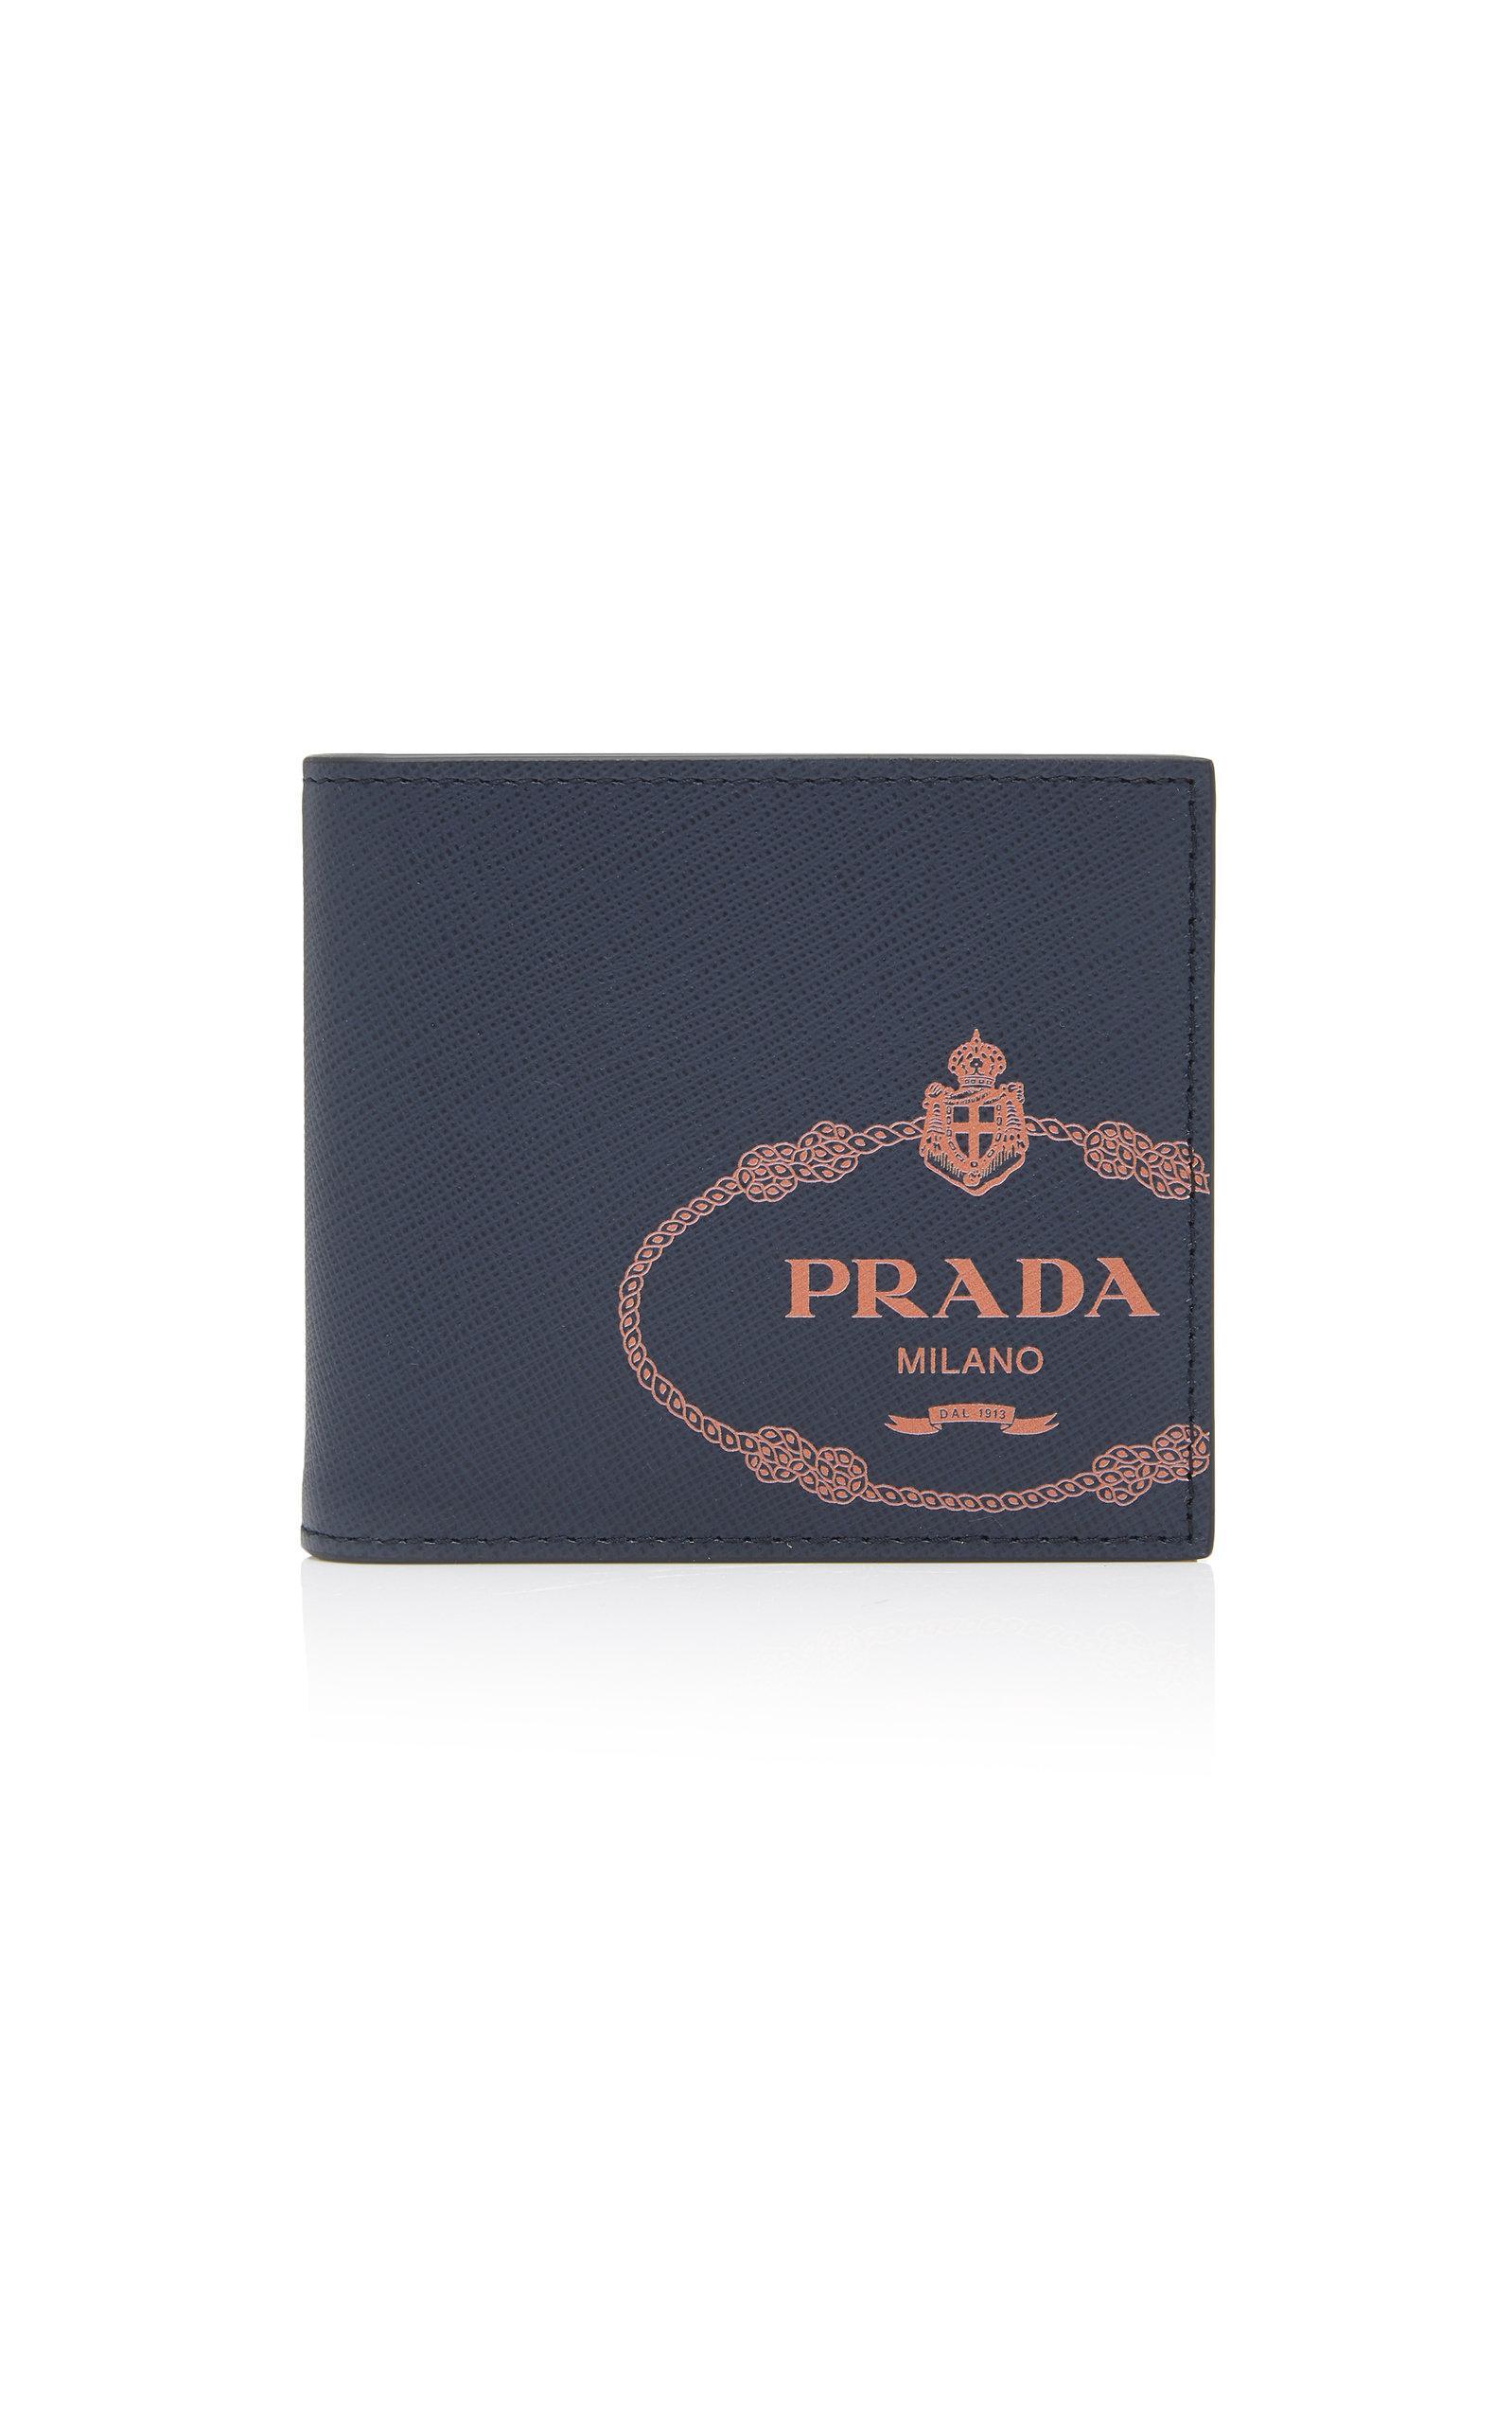 18a9b7db1d66 Prada - Blue Logo-printed Saffiano Leather Wallet for Men - Lyst. View  fullscreen